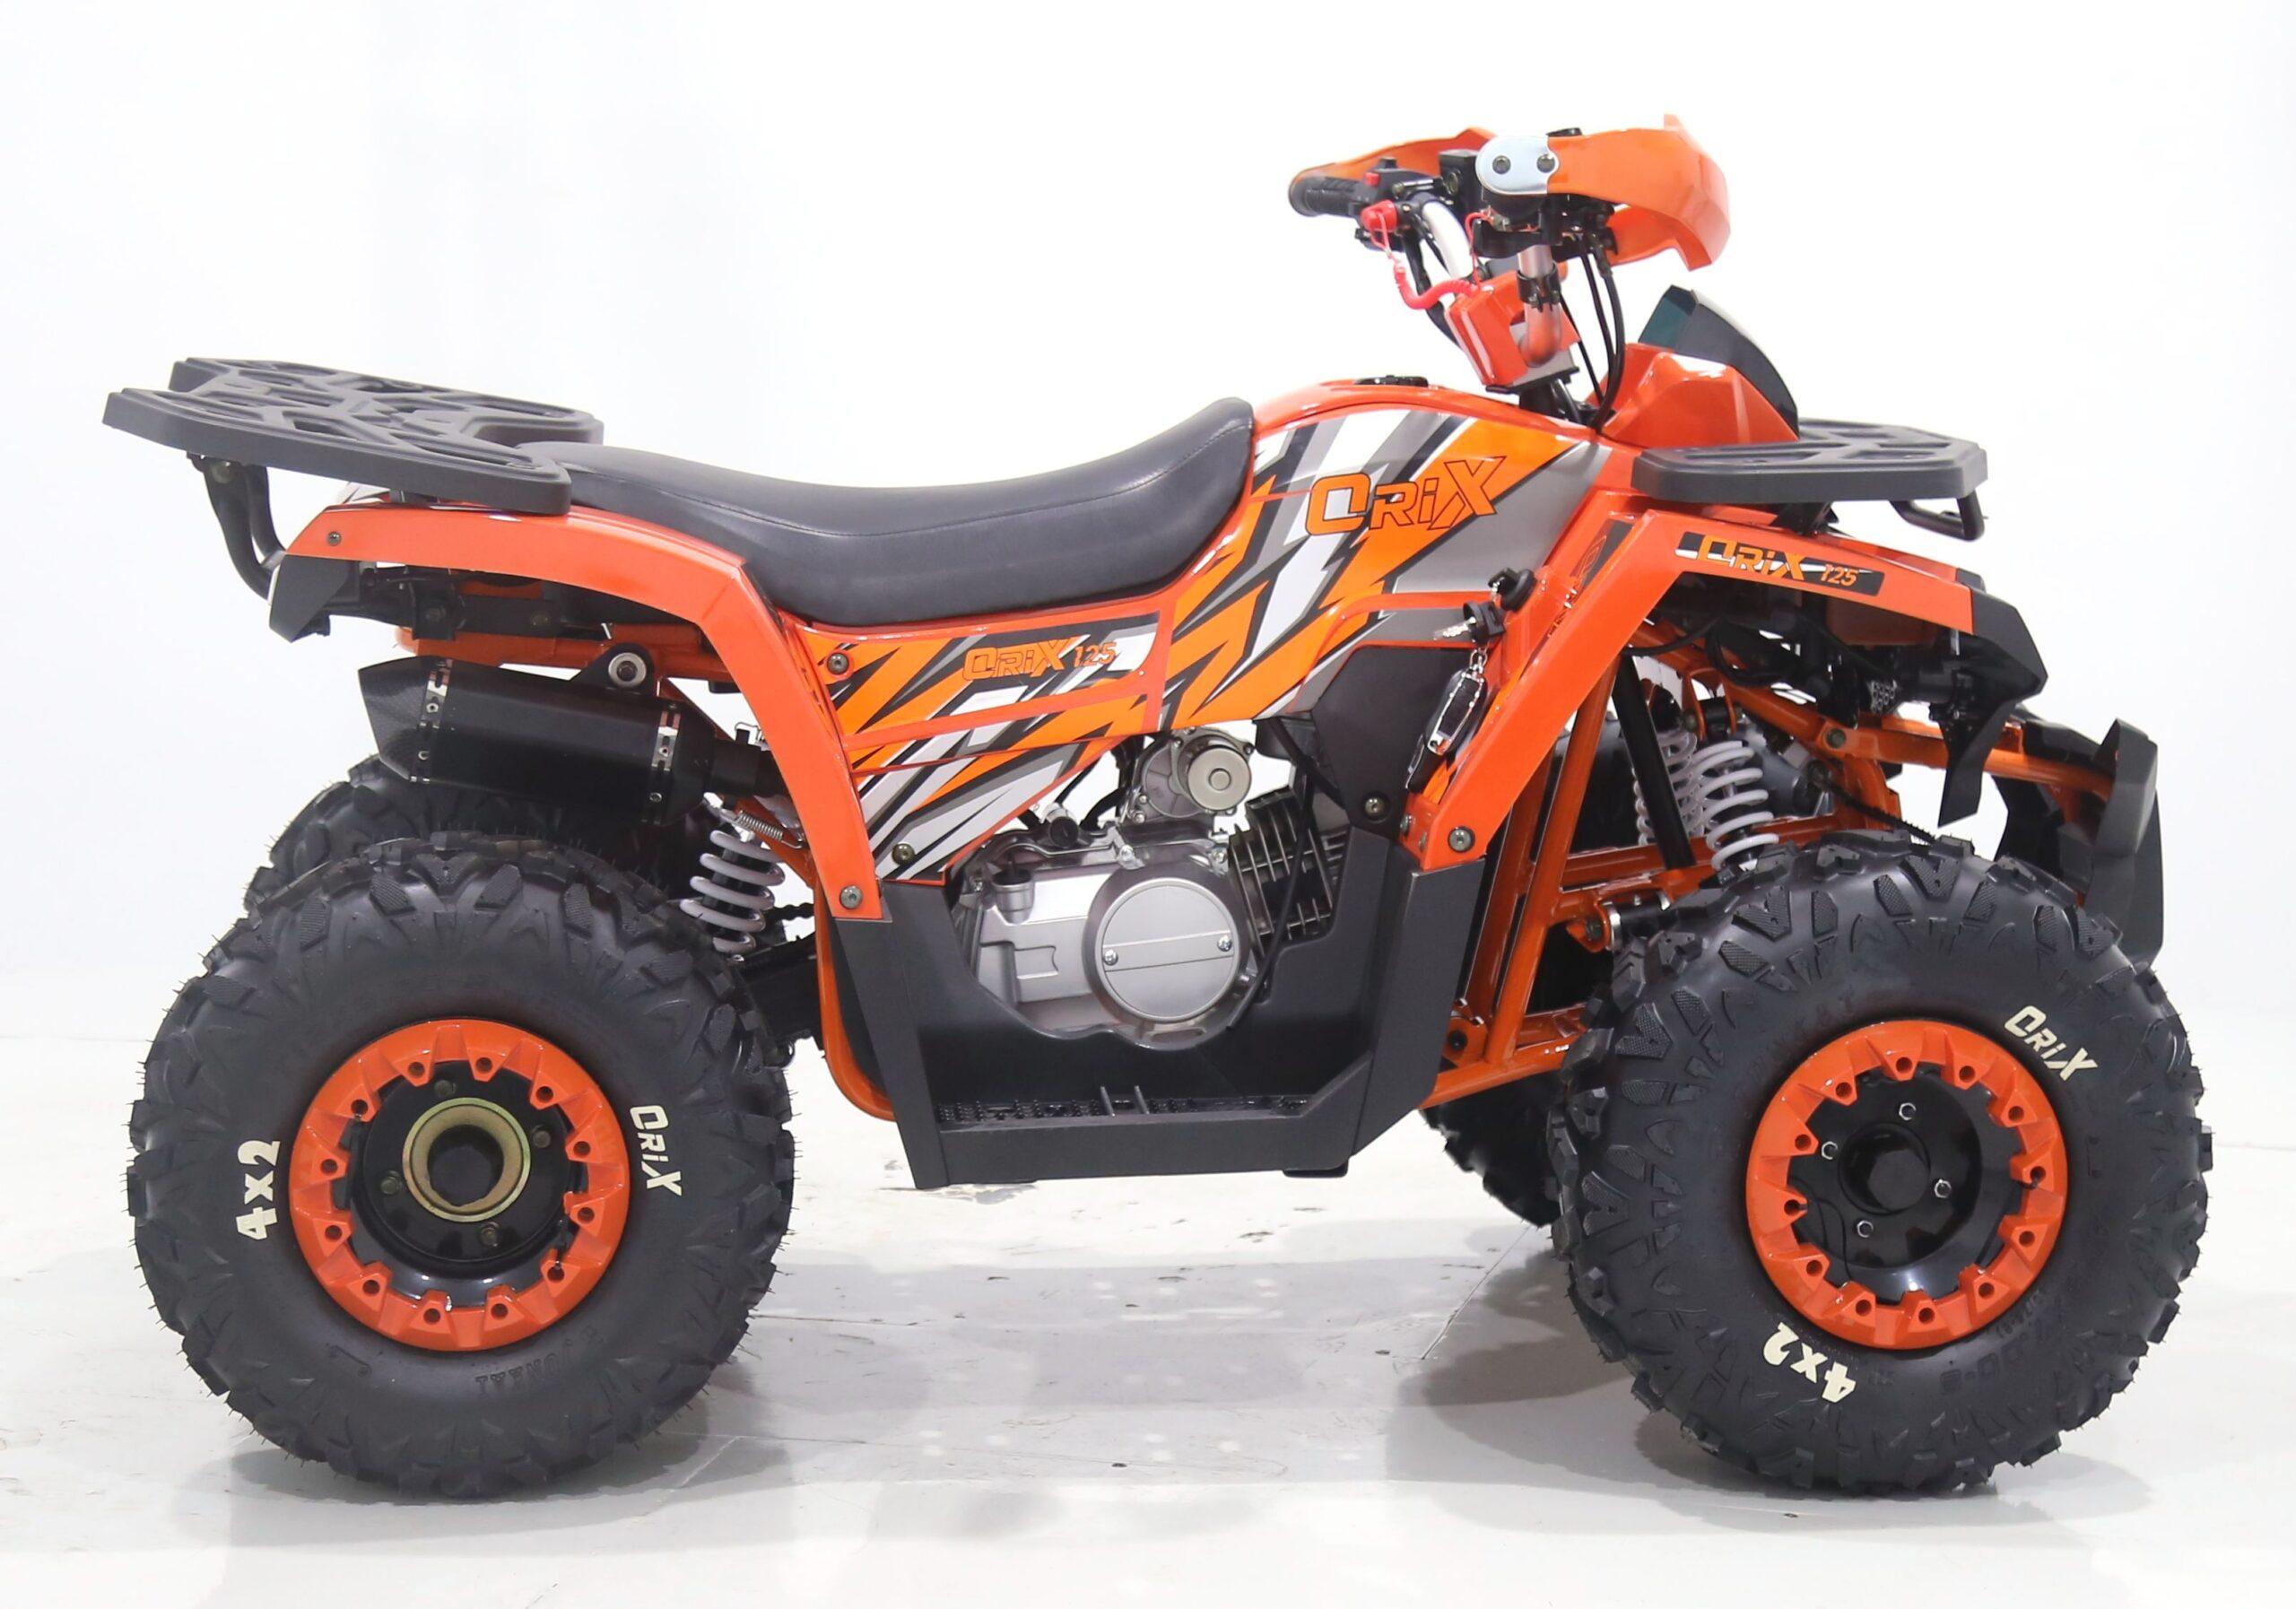 ДЕТСКИЙ КВАДРОЦИКЛ ORIX 125  Артмото - купить квадроцикл в украине и харькове, мотоцикл, снегоход, скутер, мопед, электромобиль